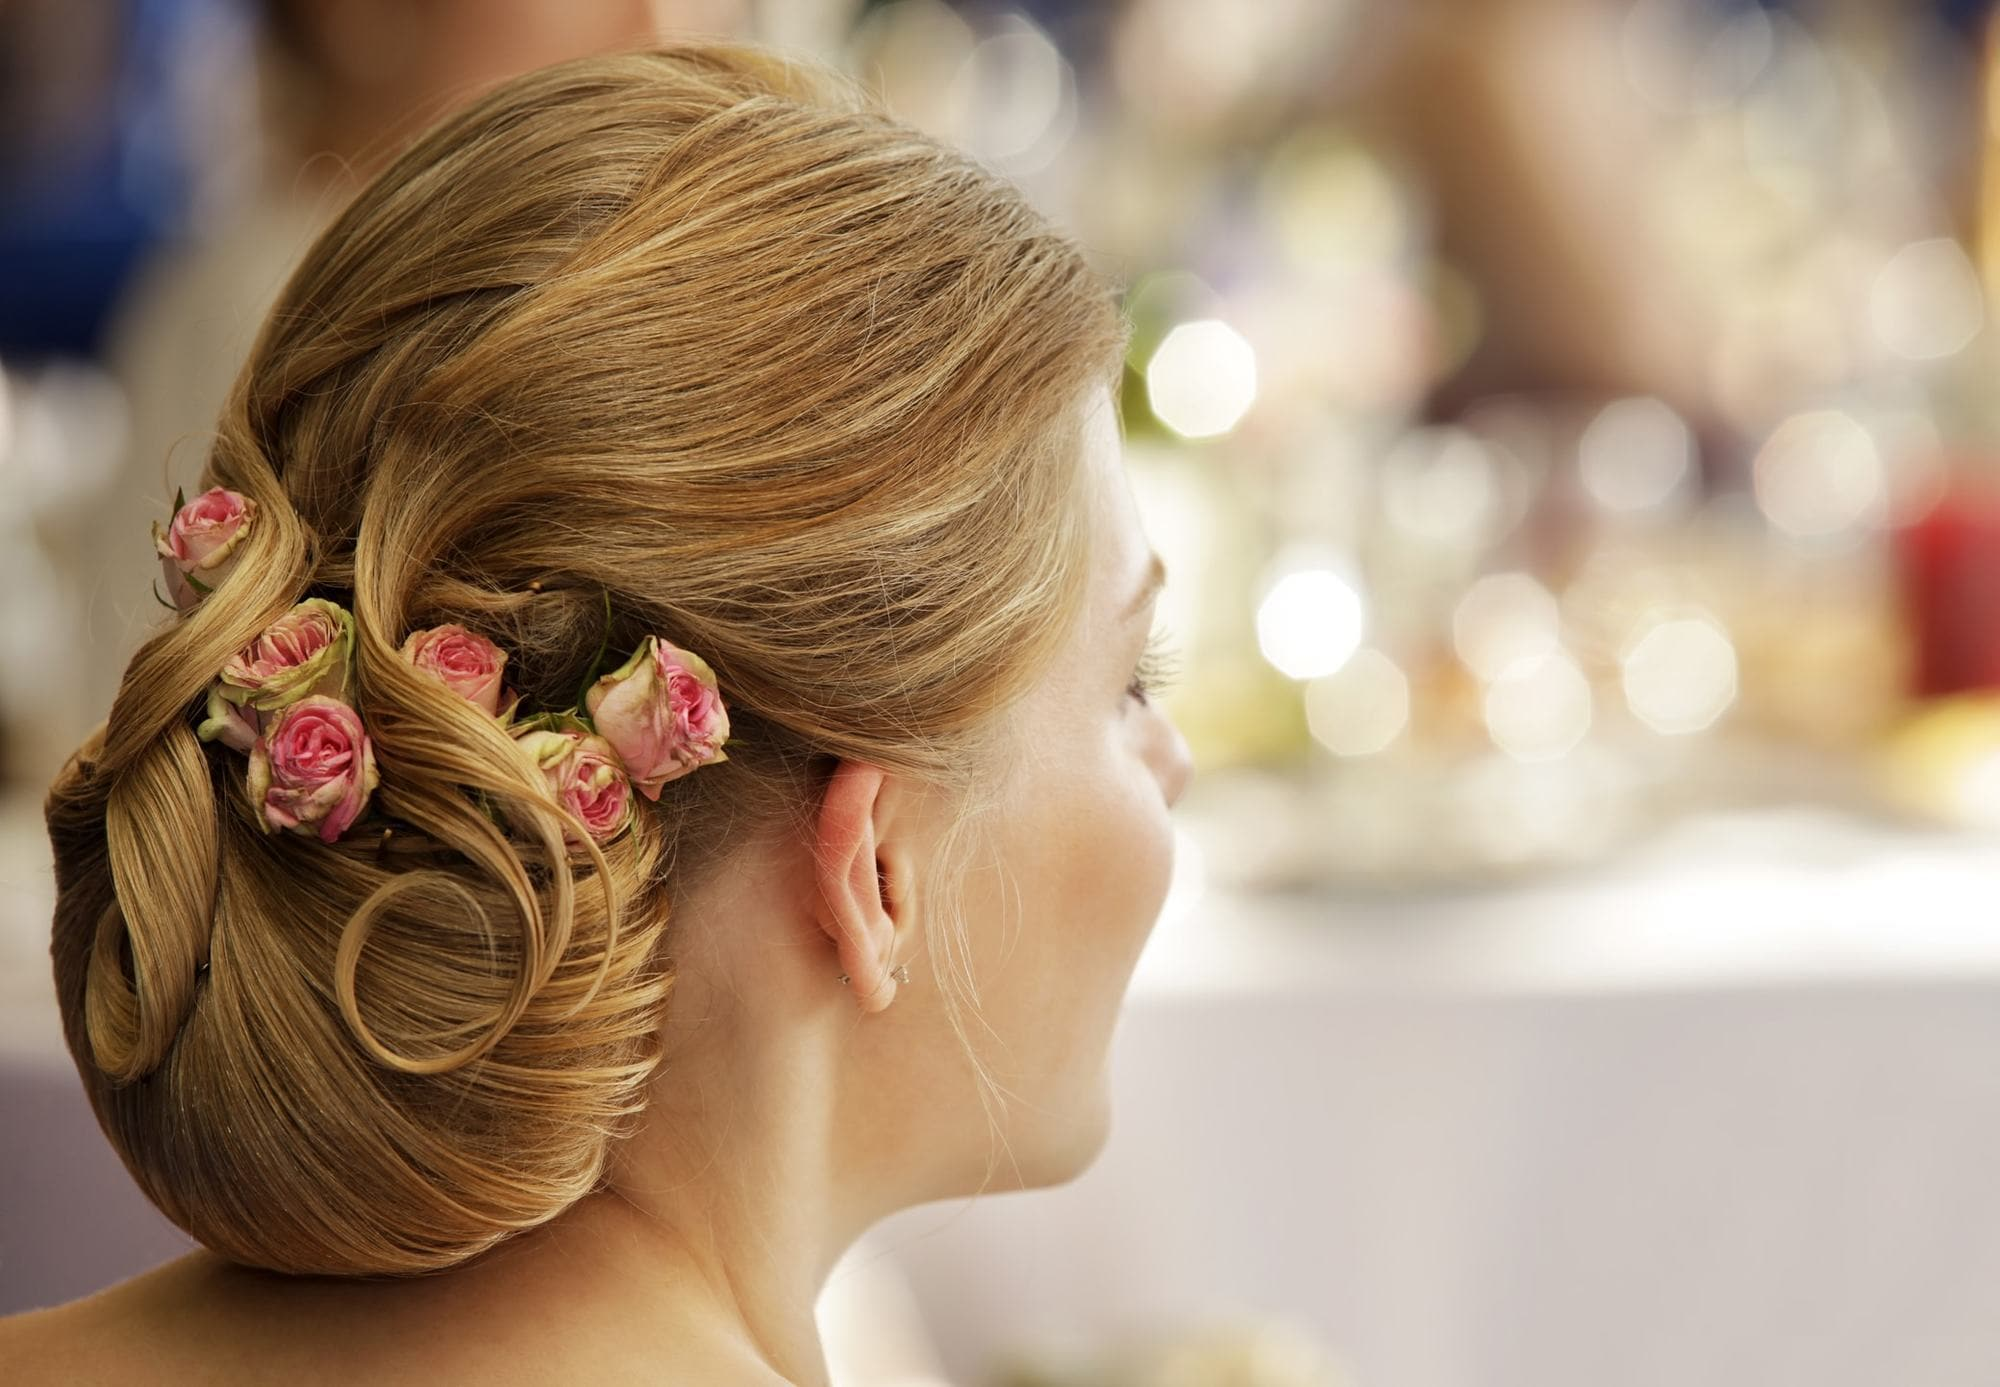 flower girl hairstyles styled updo flowers blonde